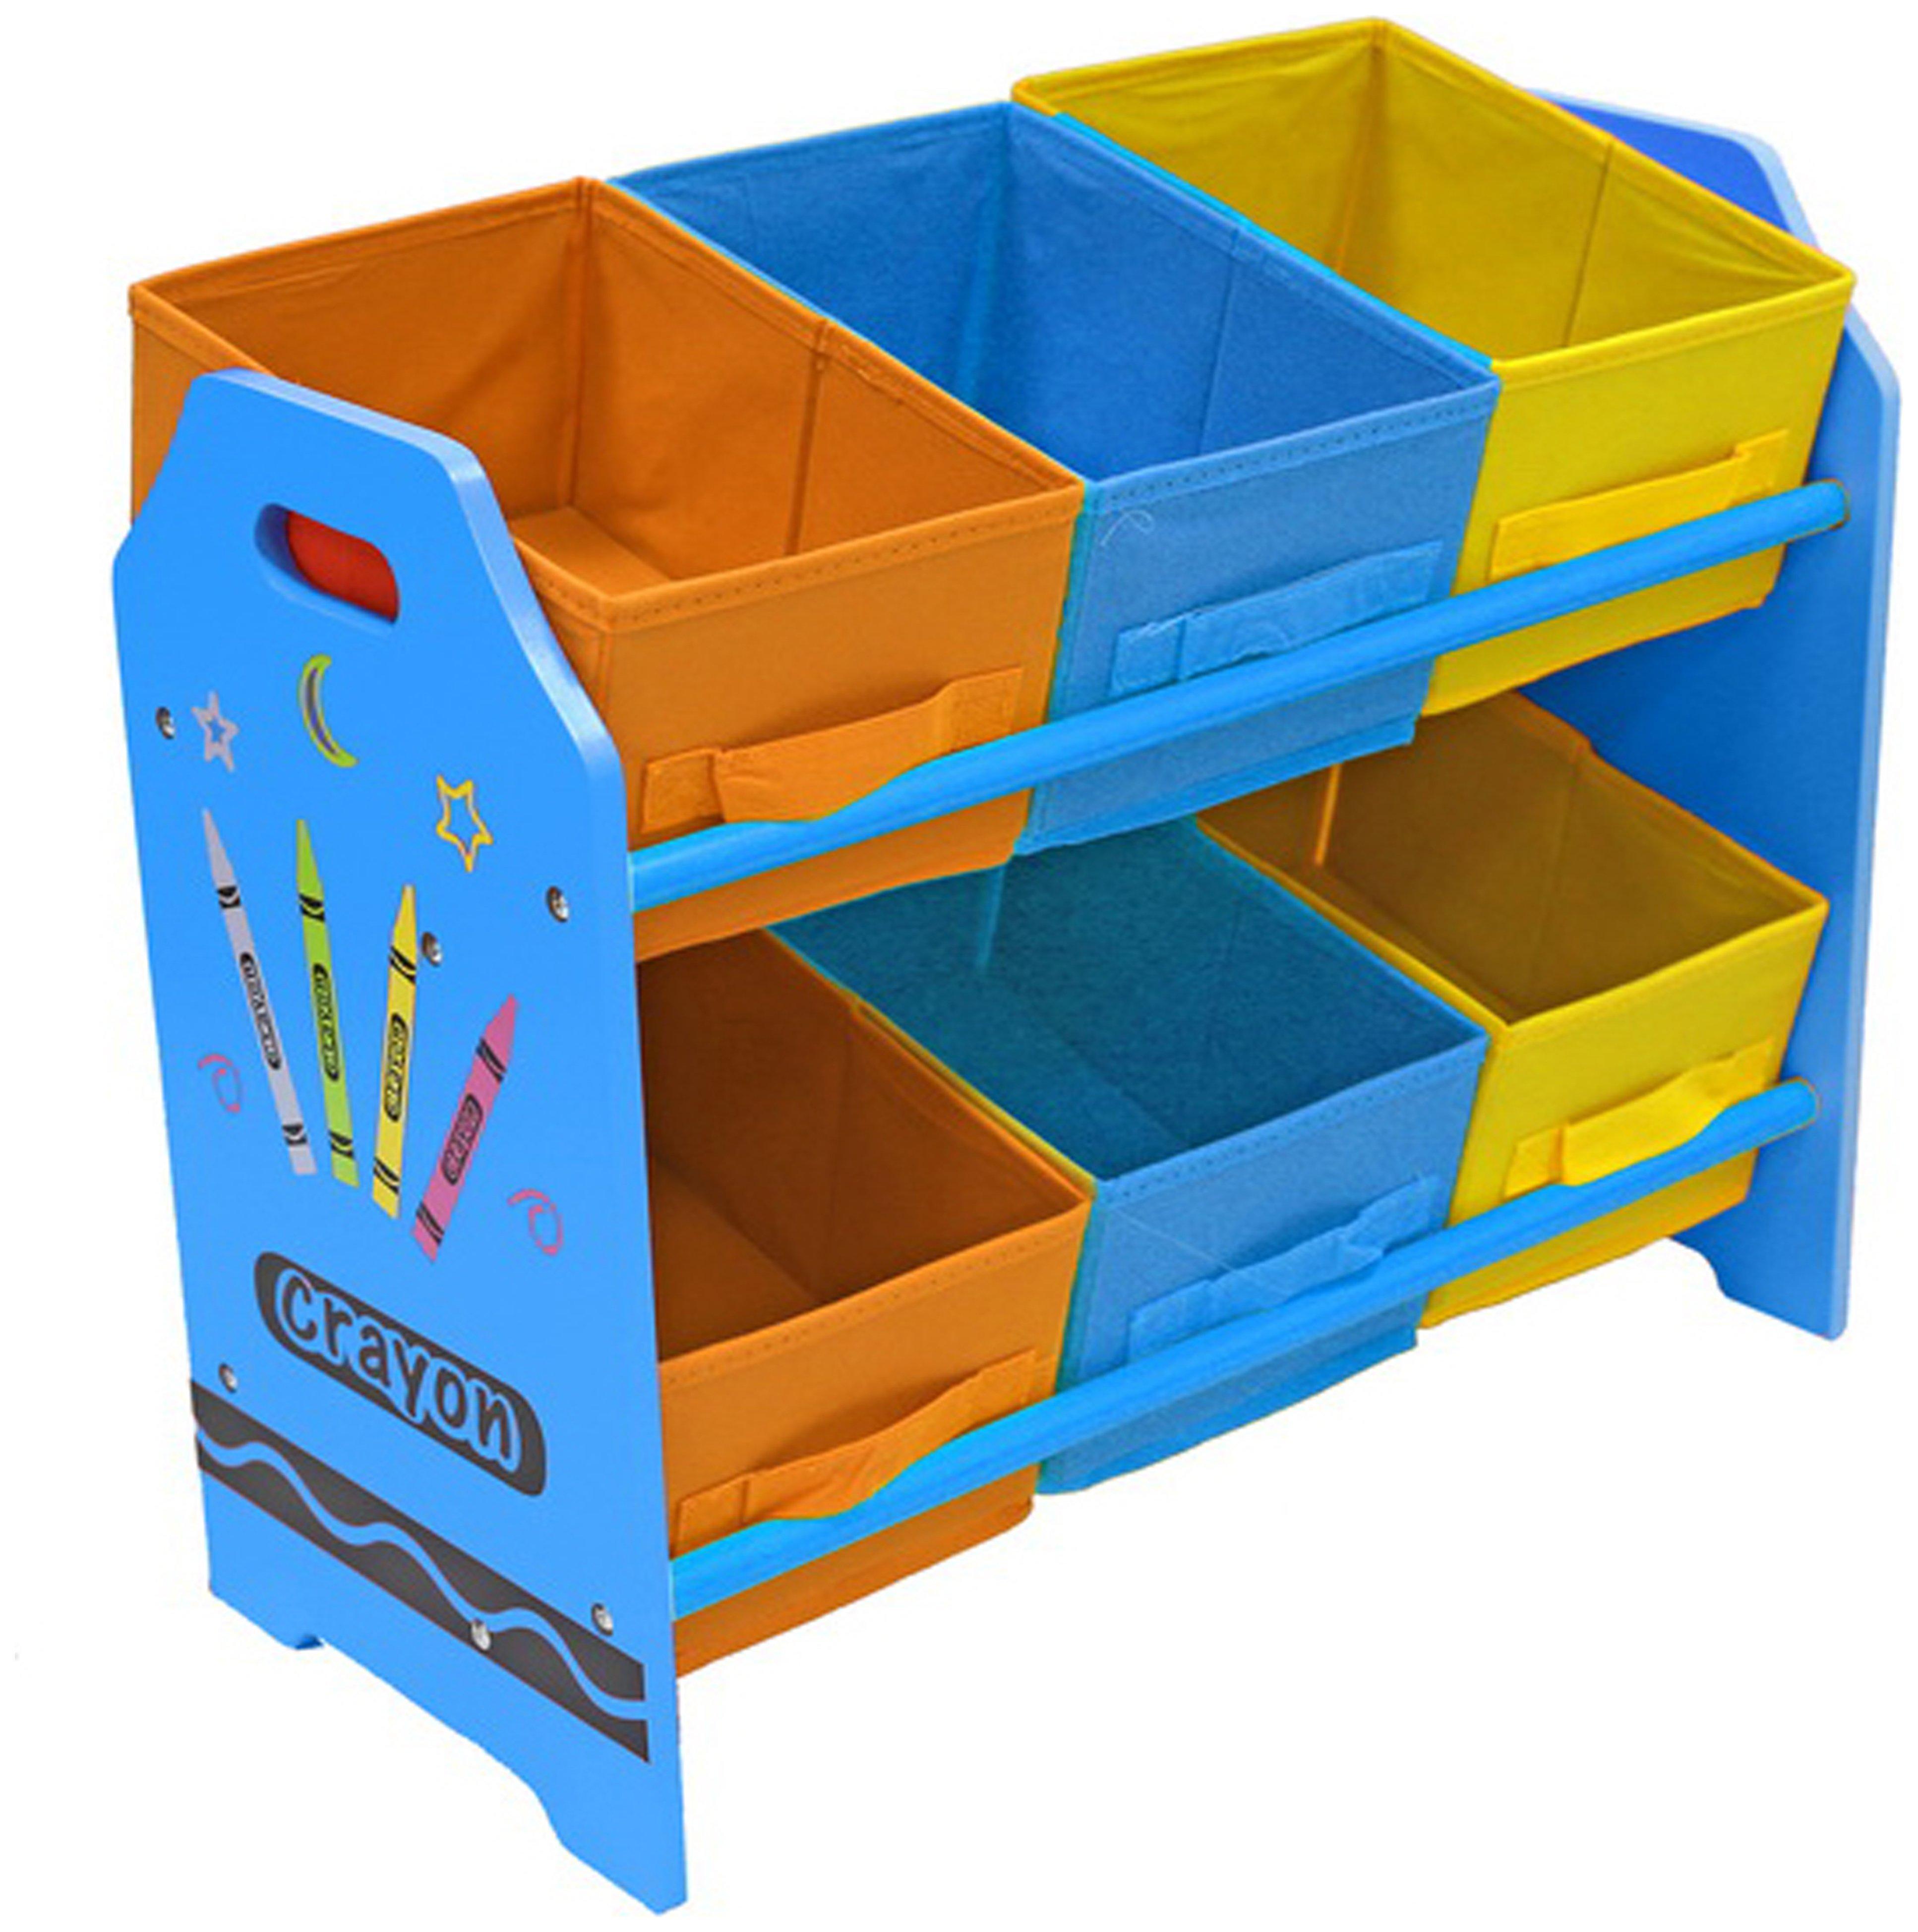 Image of Bebe Style Crayon Bin Storage - Blue.